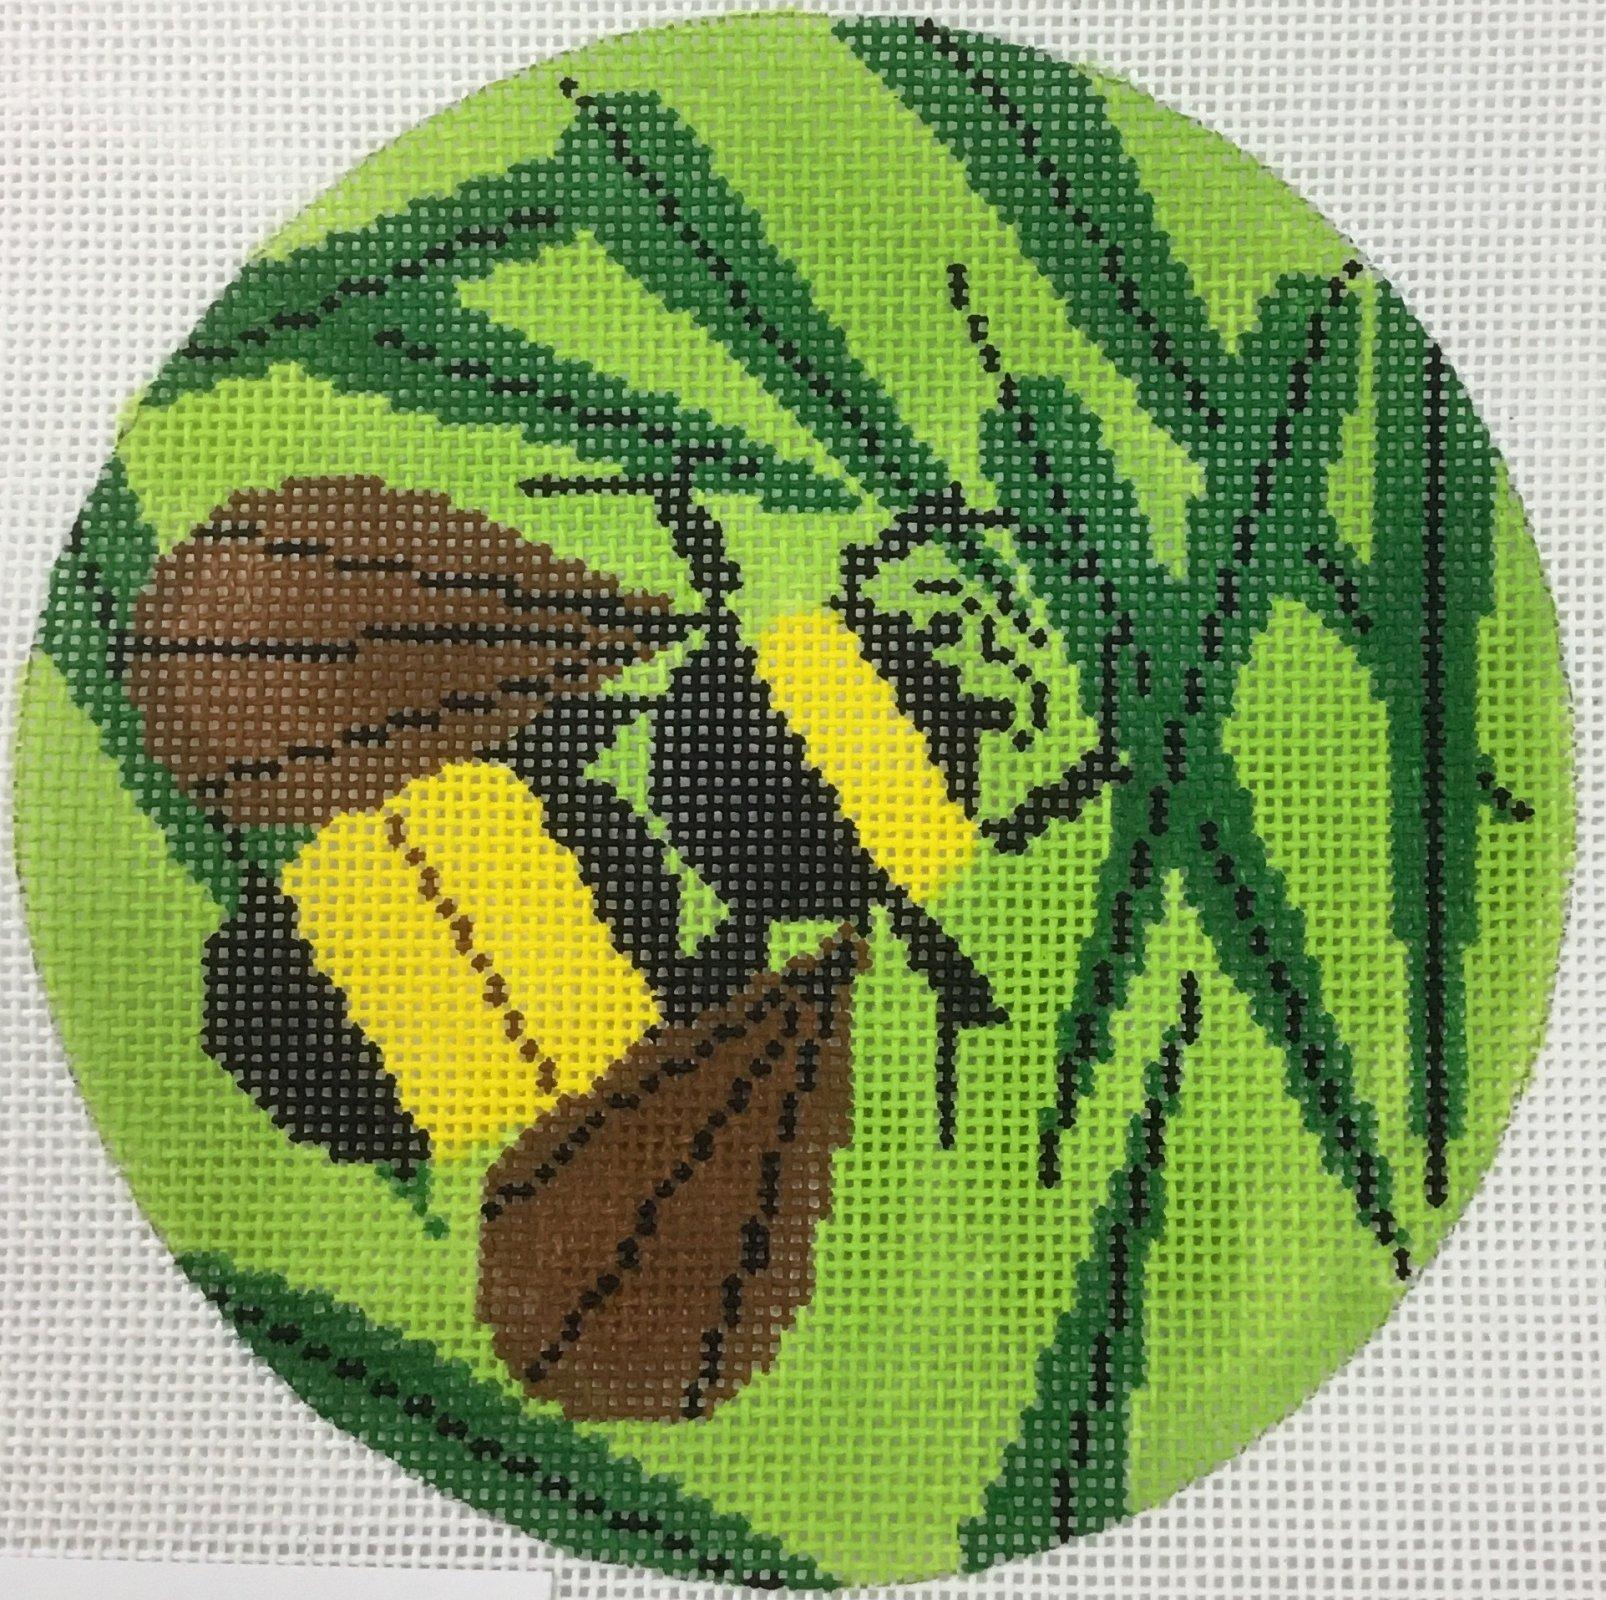 Bee Green Bkgrnd, 18M, 5